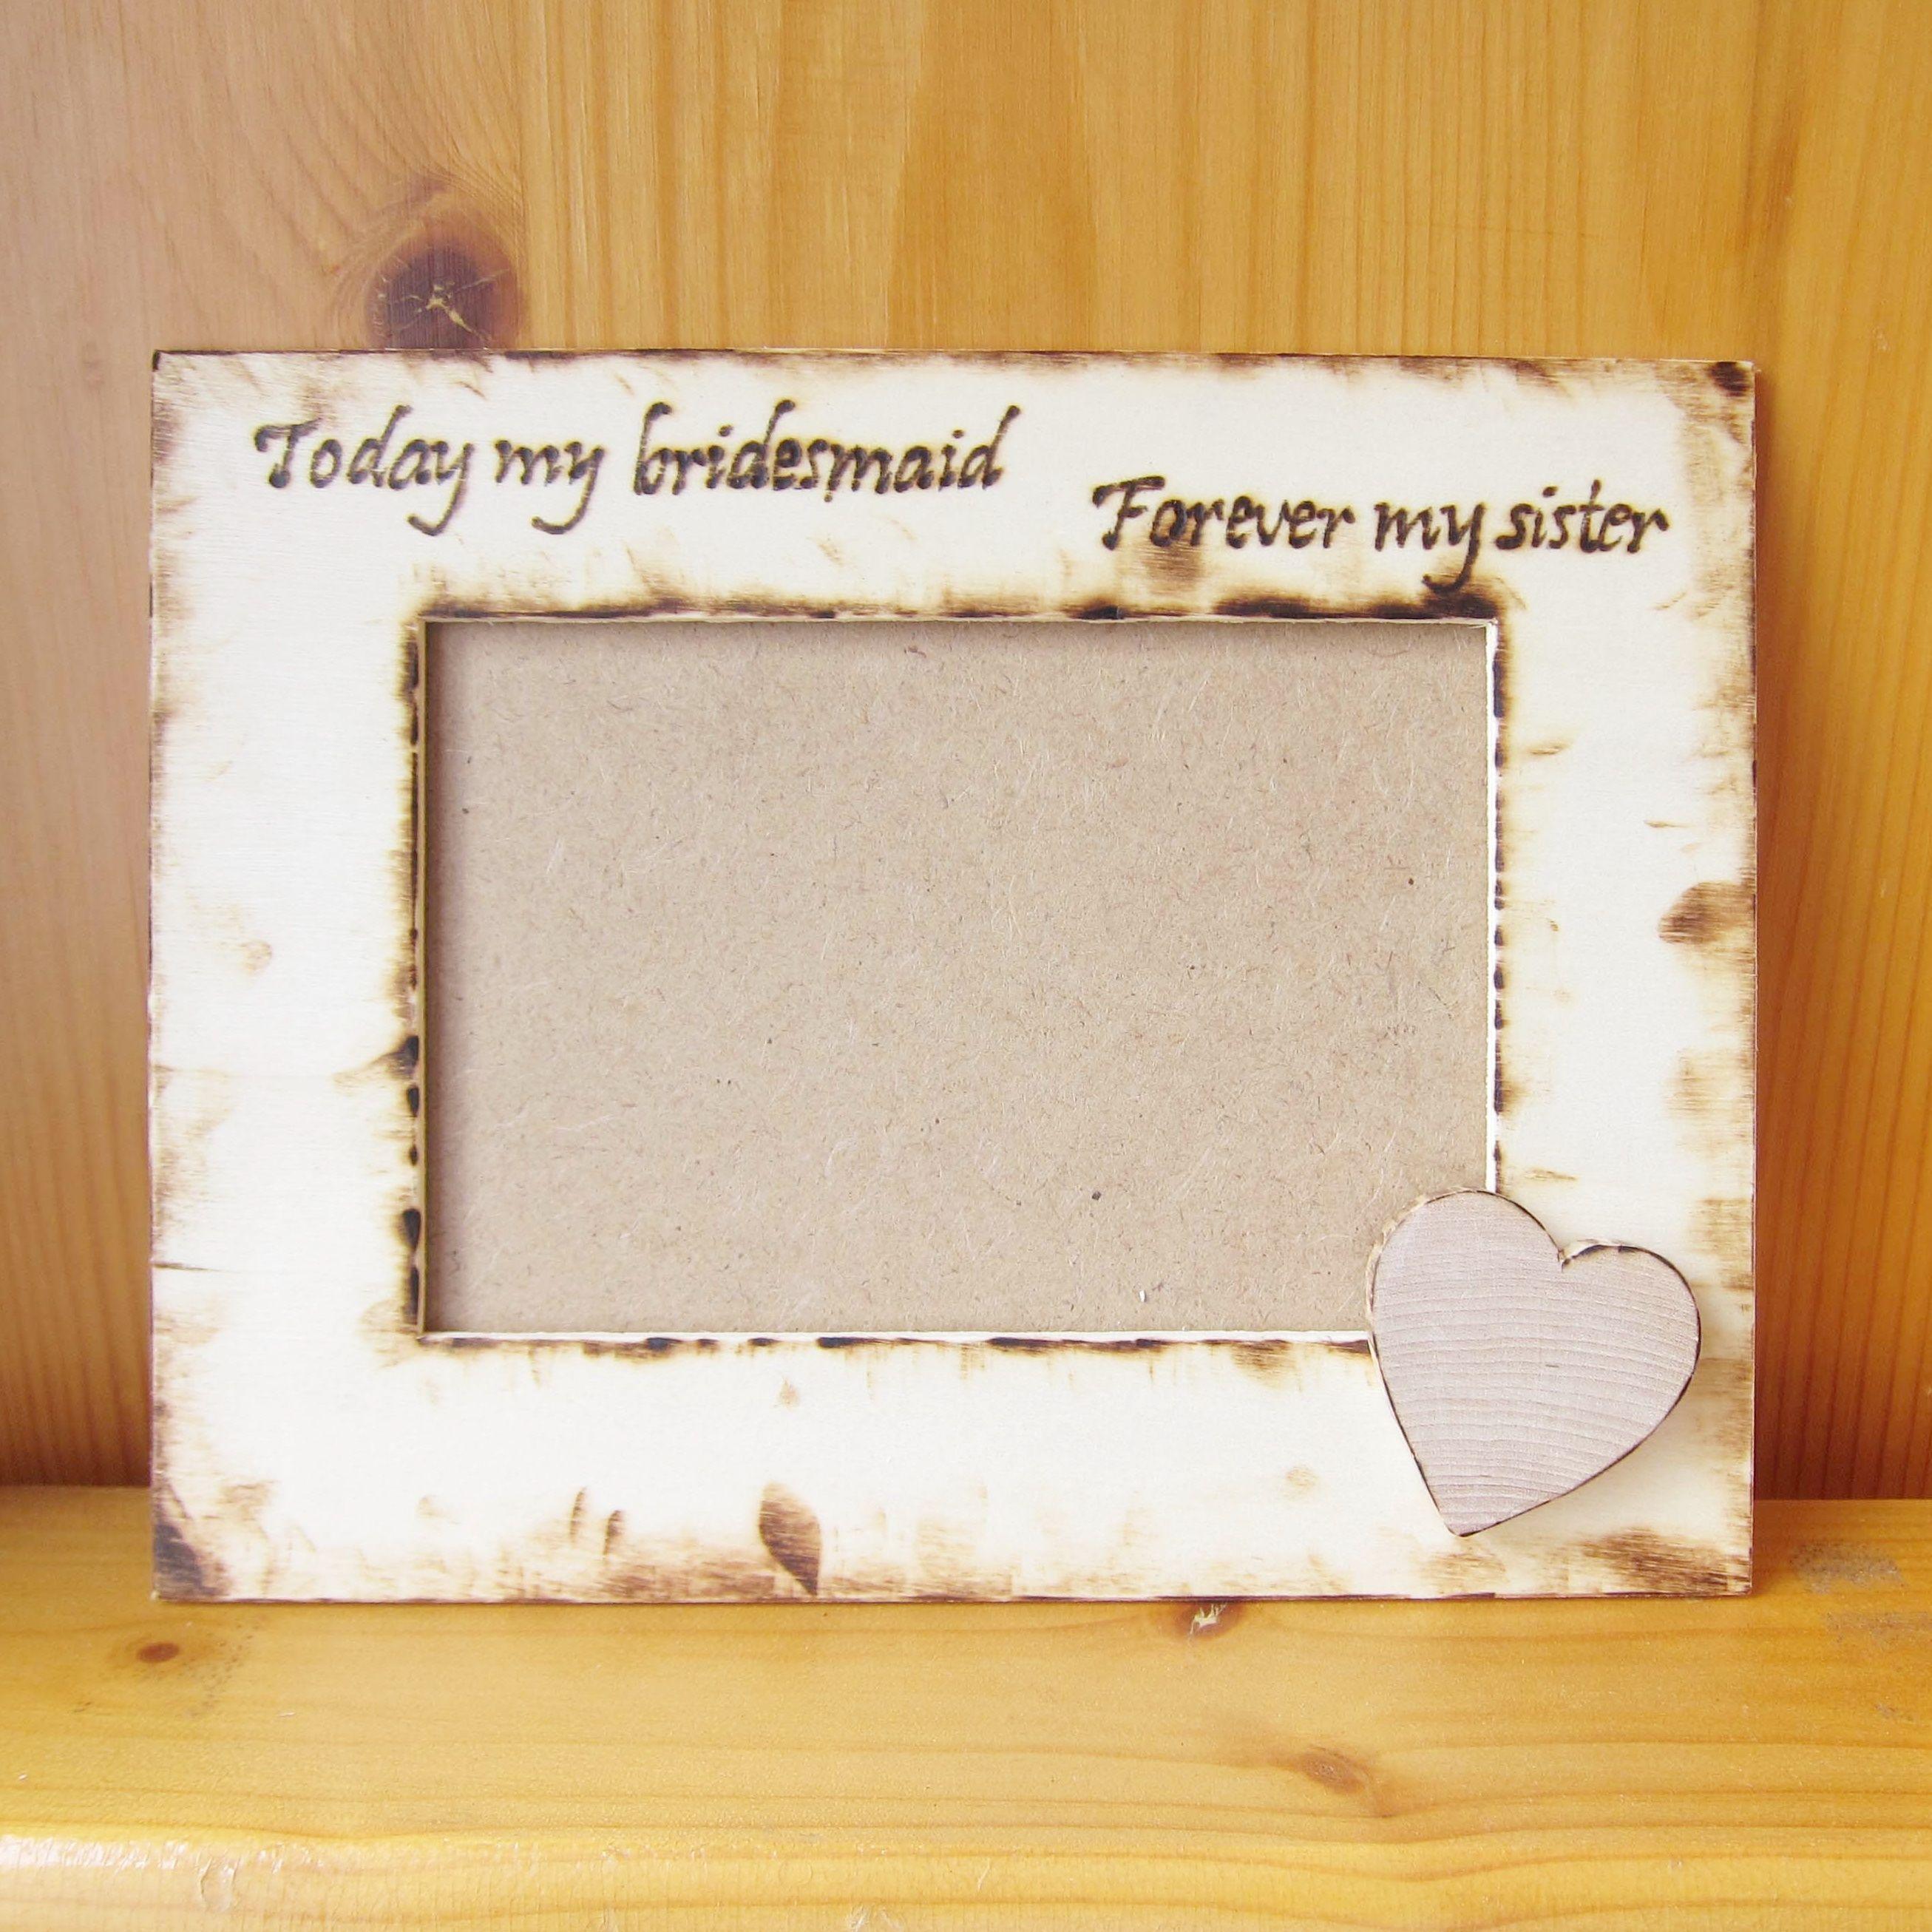 NEW! Custom Wood Burn Photo Frames for Bridesmaid   Kids Crafts ...